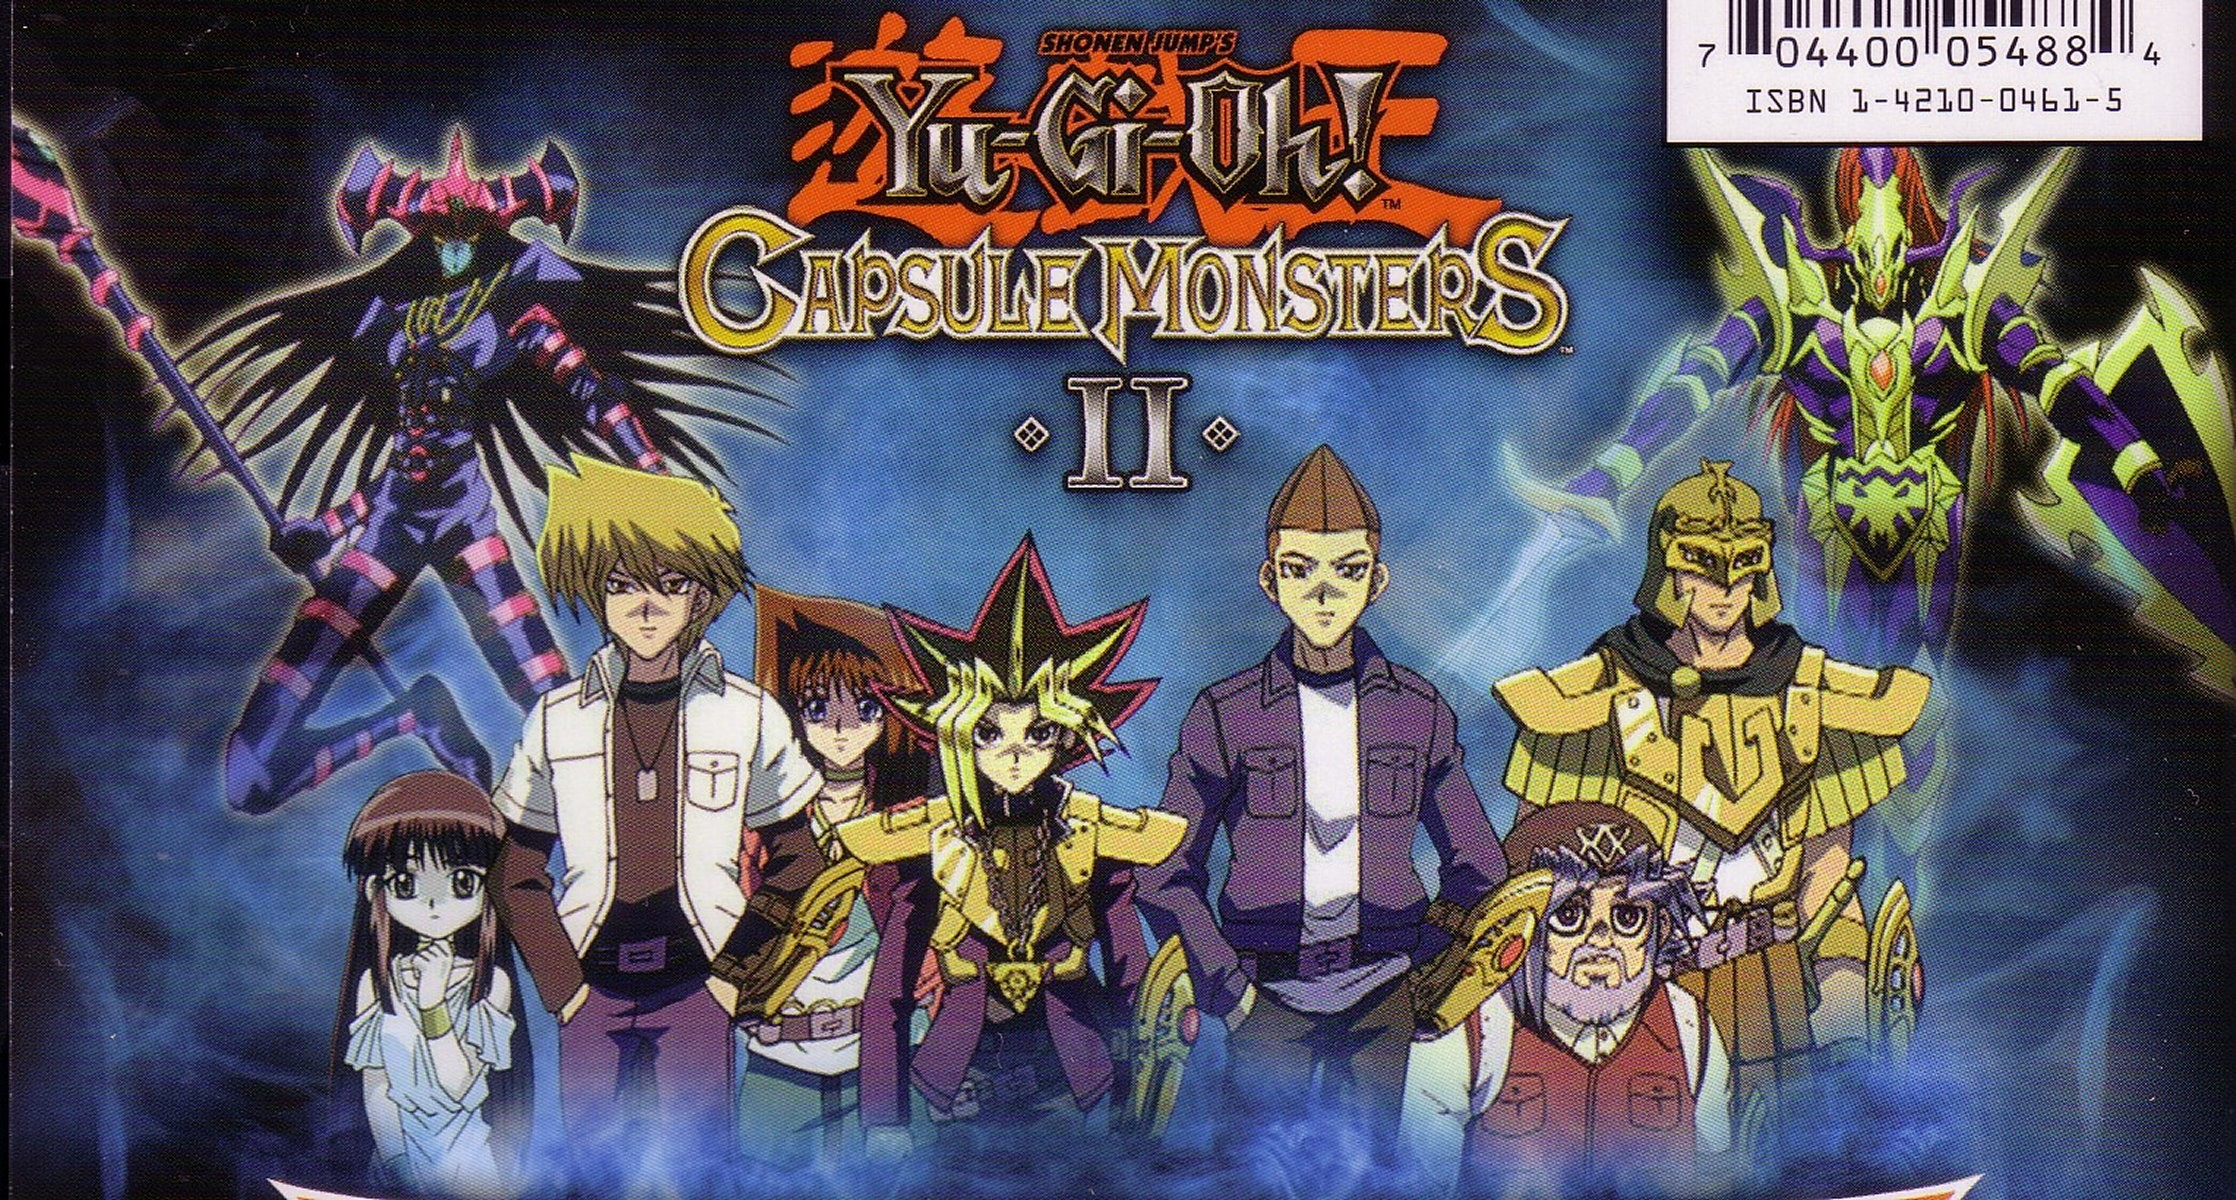 Tags: Anime, Takahashi Kazuki, Studio Gallop, Capsule Monsters, Yu-Gi